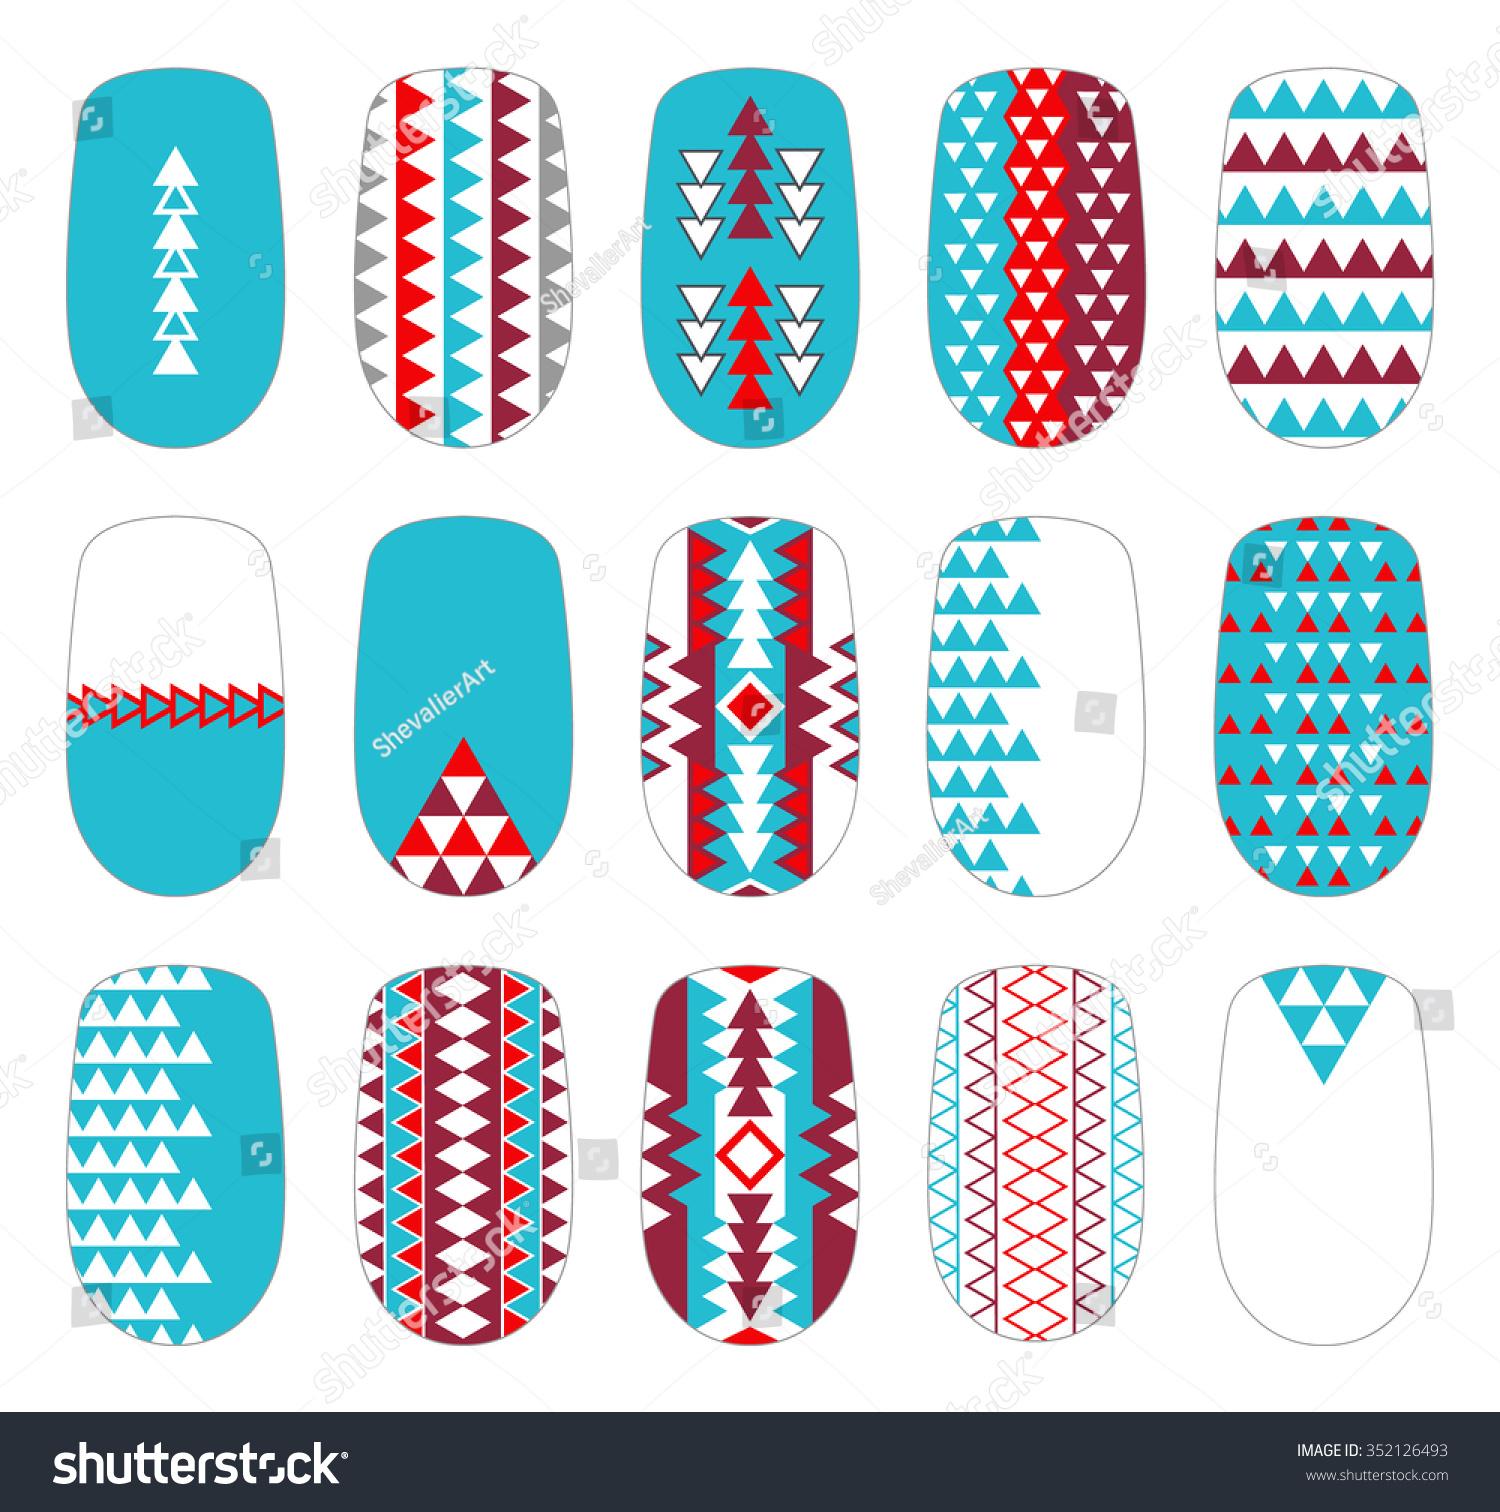 Nail Art Vector: Nail Art Colorful Geometric Templates. Manicure Design Set